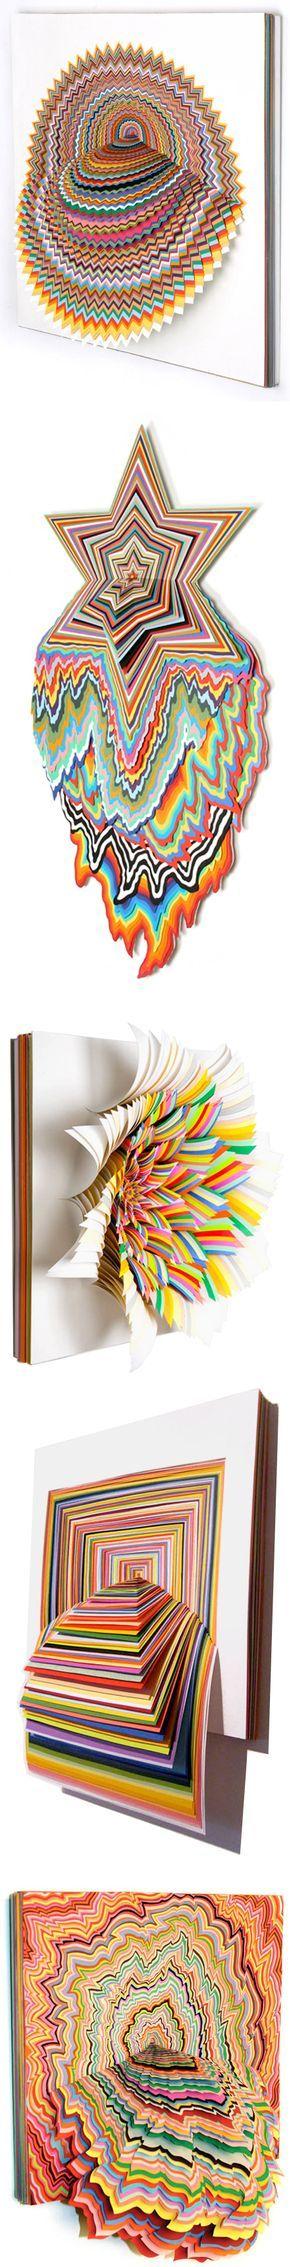 Jen Stark Paper Wall Art Love Love Love This X H Pinterest - Mesmerising hand crafted paper sculptures jen stark